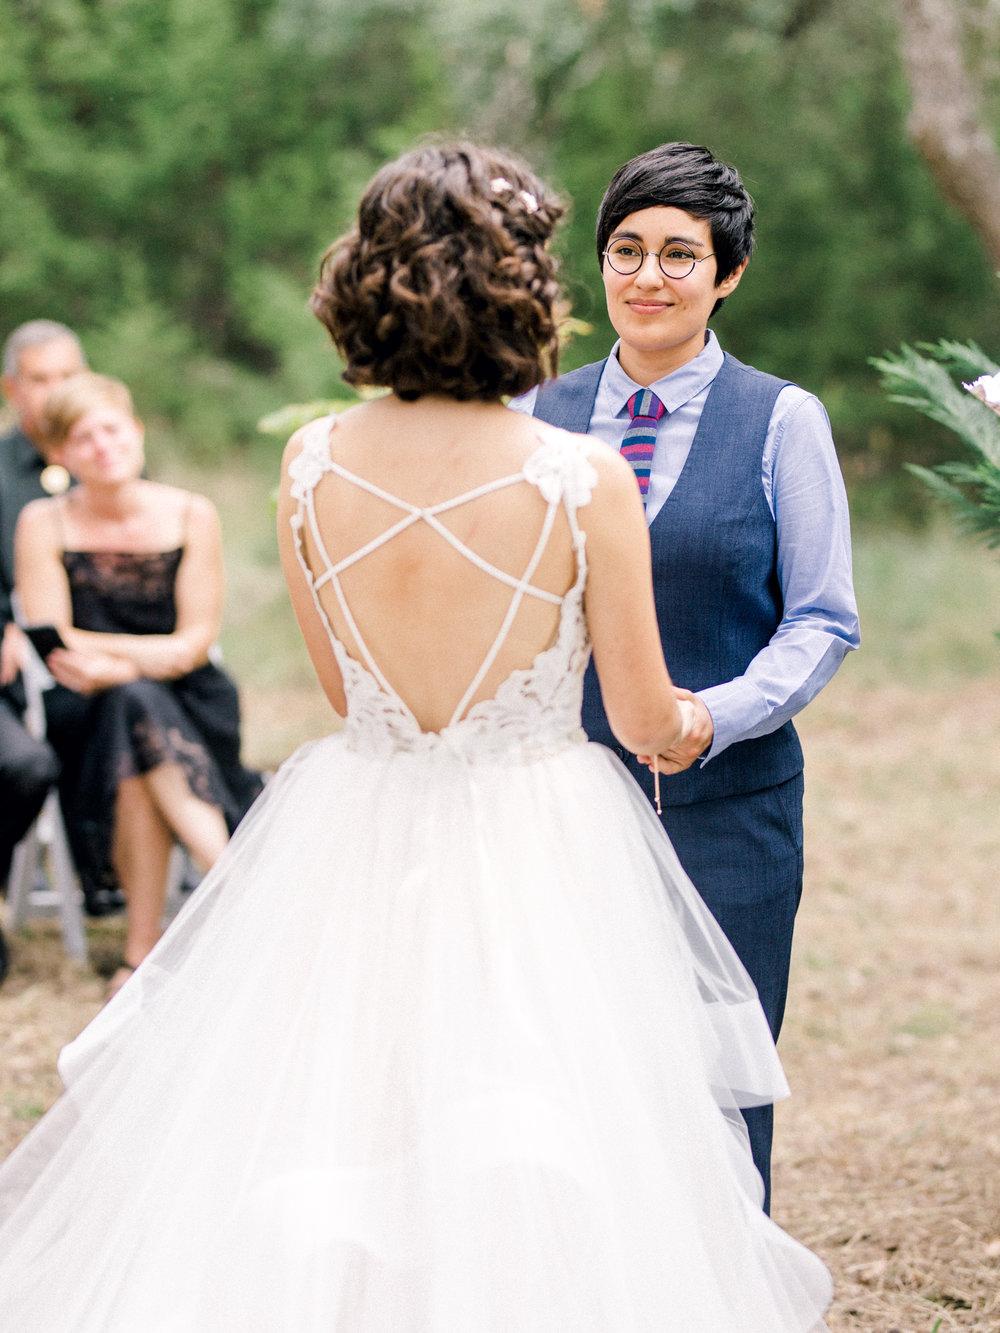 1_lgbt austin tx wedding photographerIMG_5498.jpg